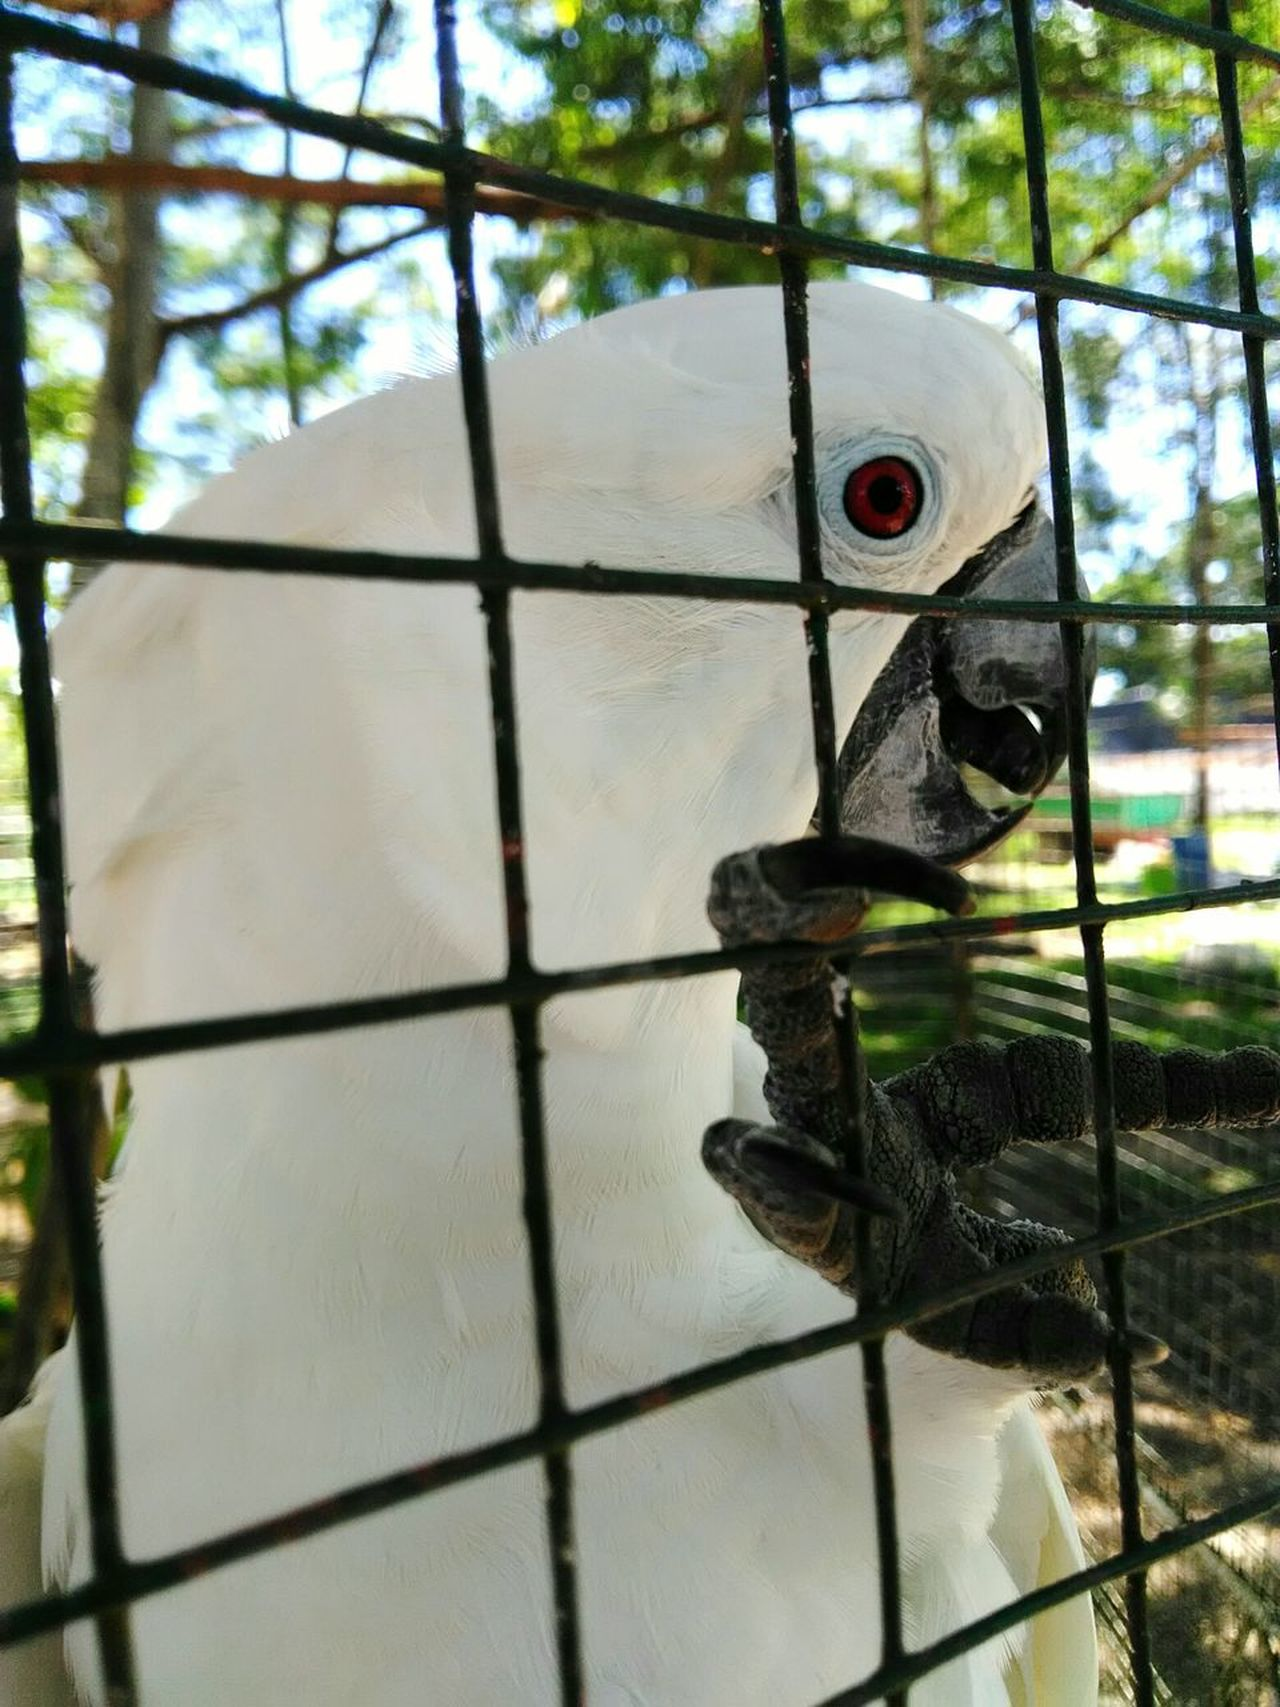 Eyeem Philippines EyeemPhilippines Mobilephotography The Great Outdoors - 2017 EyeEm Awards Day No People Metal Grate Indoors  Sky Close-up Prison Bird Animal Themes Animal Wildlife